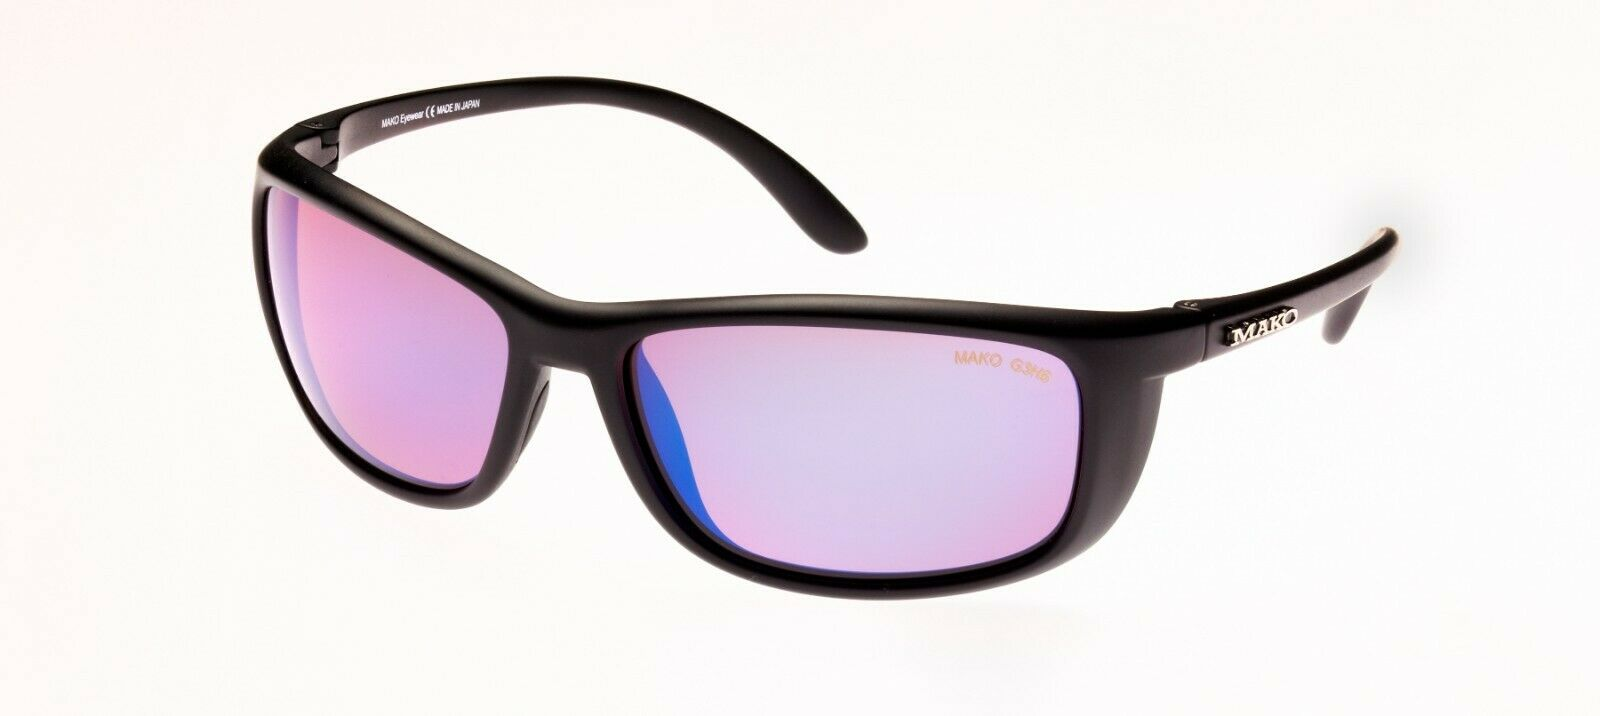 Mako BLADE-Glass HD  Copper Mirror Sunglasses Fishing Polarised 9569 MO1 G3H6+Hat  here has the latest